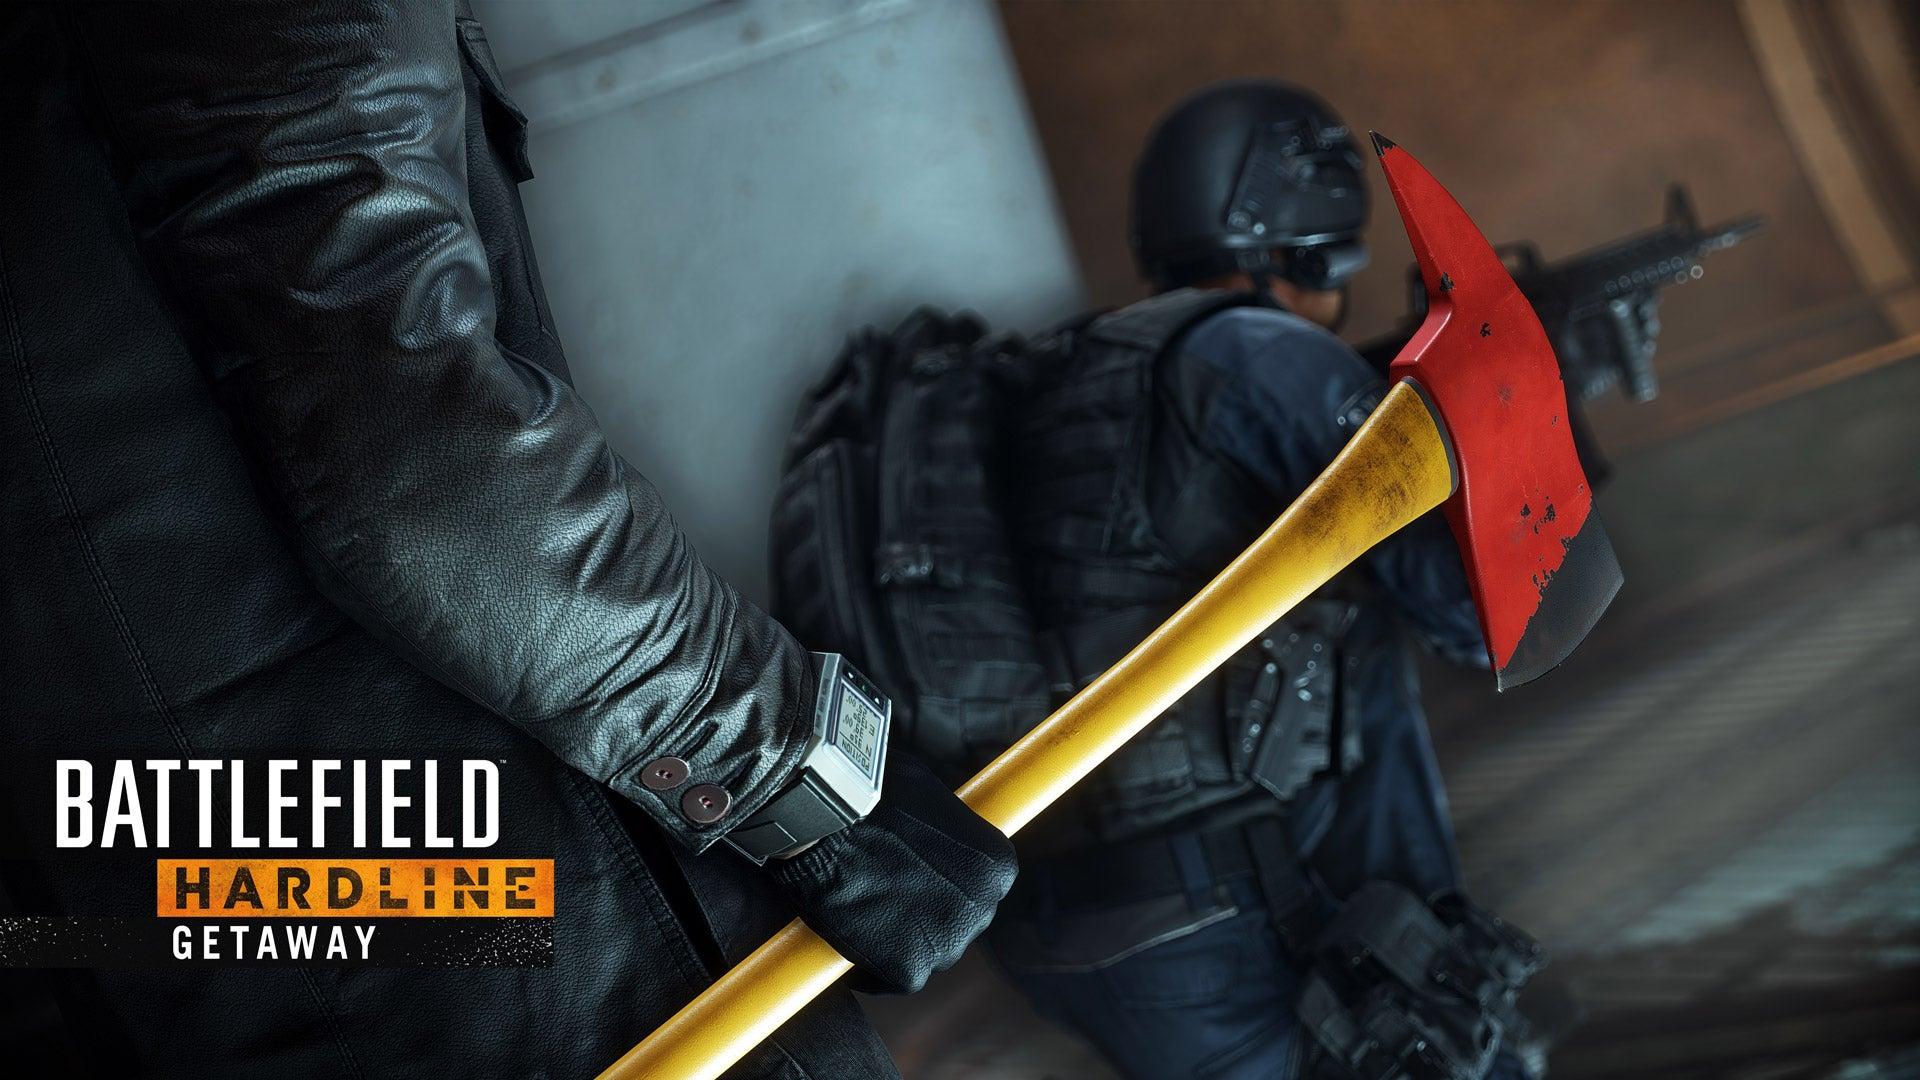 Image for Battlefield Hardline Getaway DLC free on PC, PS3 & PS4